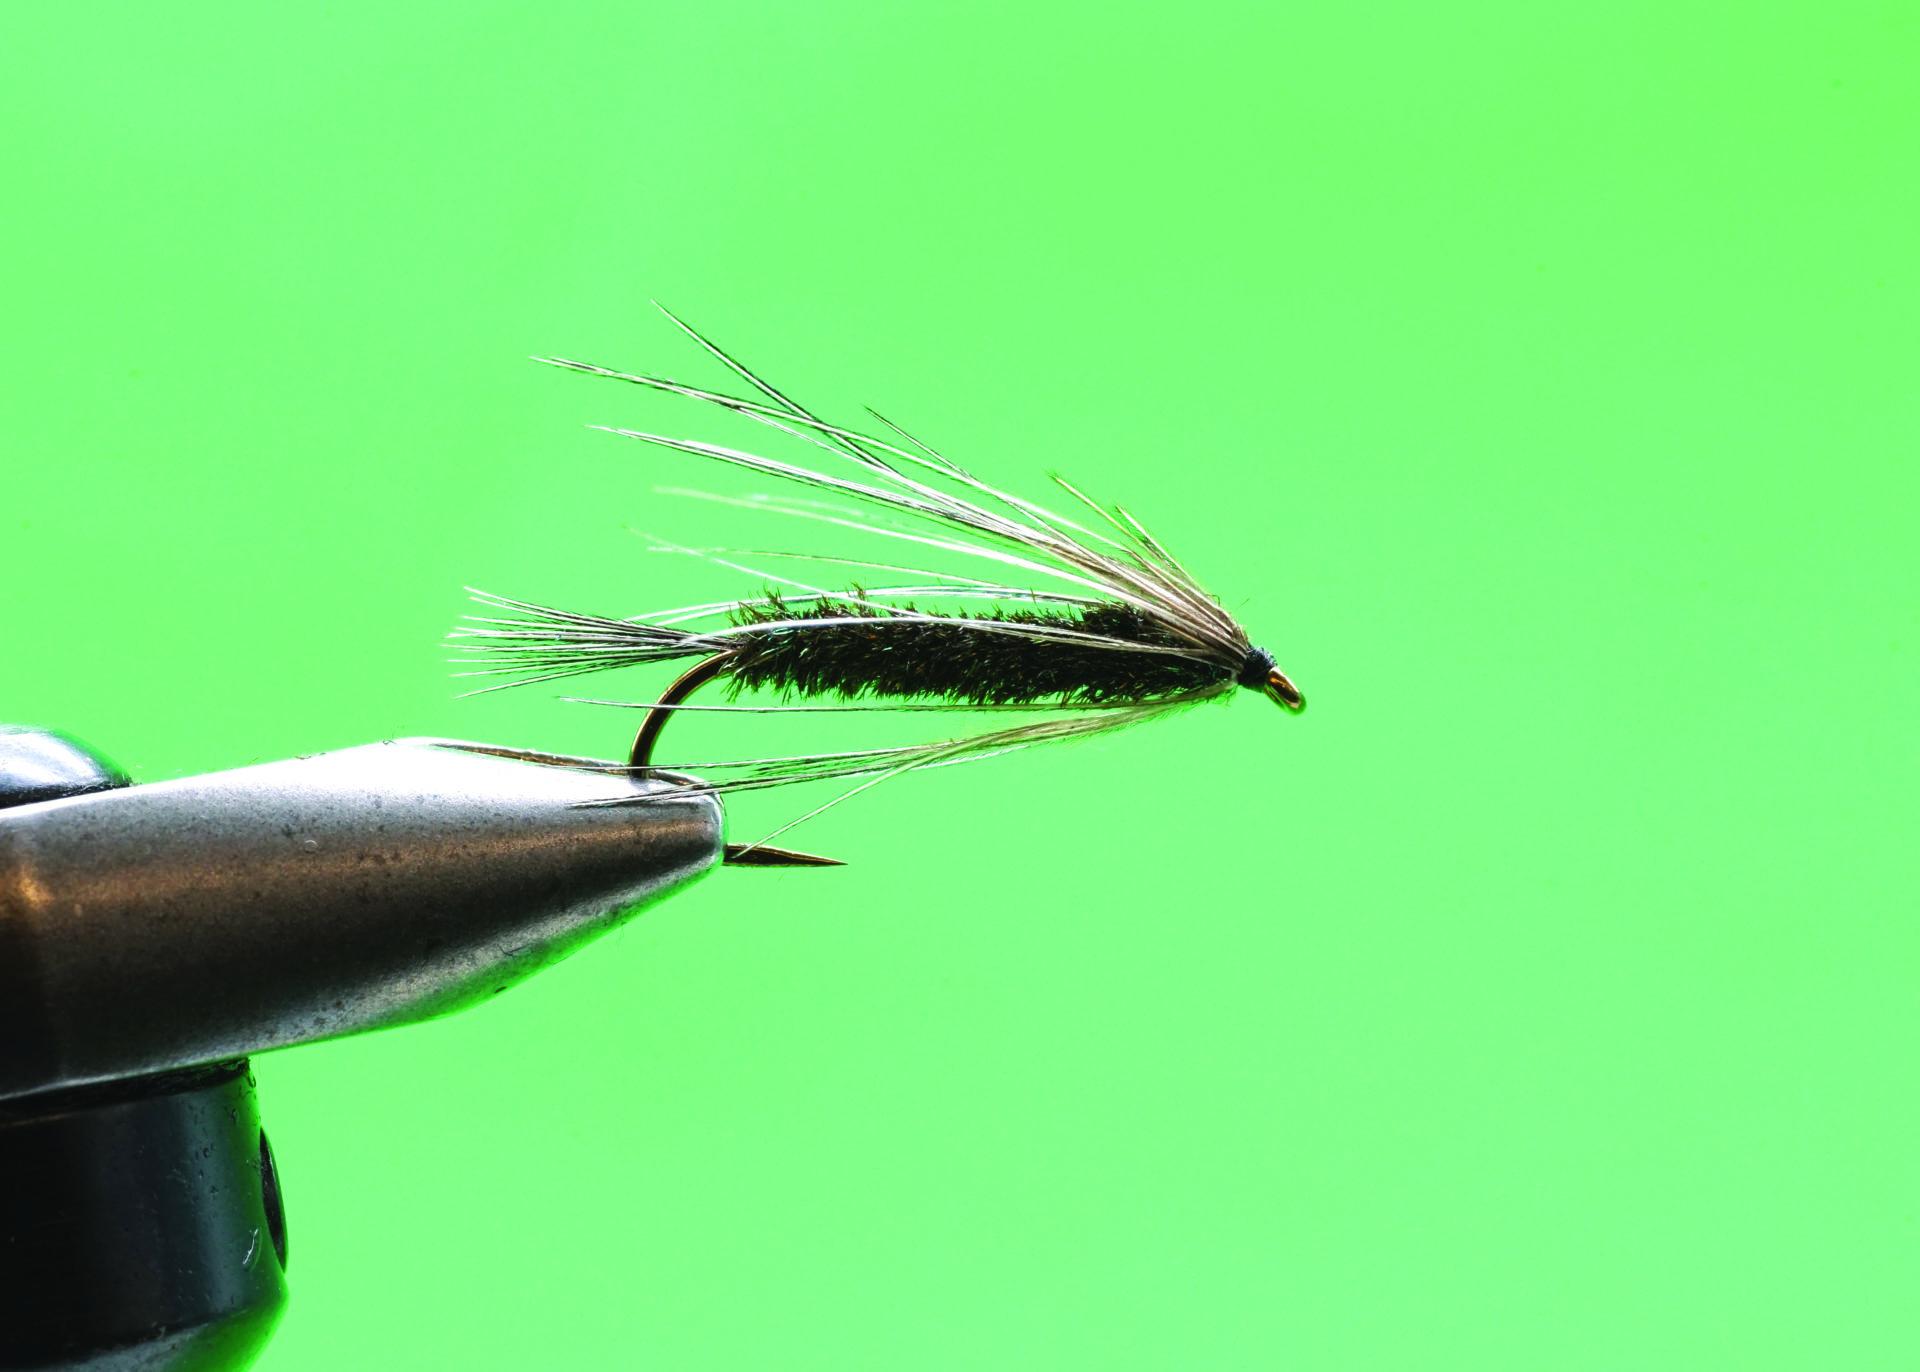 Peacock Carey: Step 7.